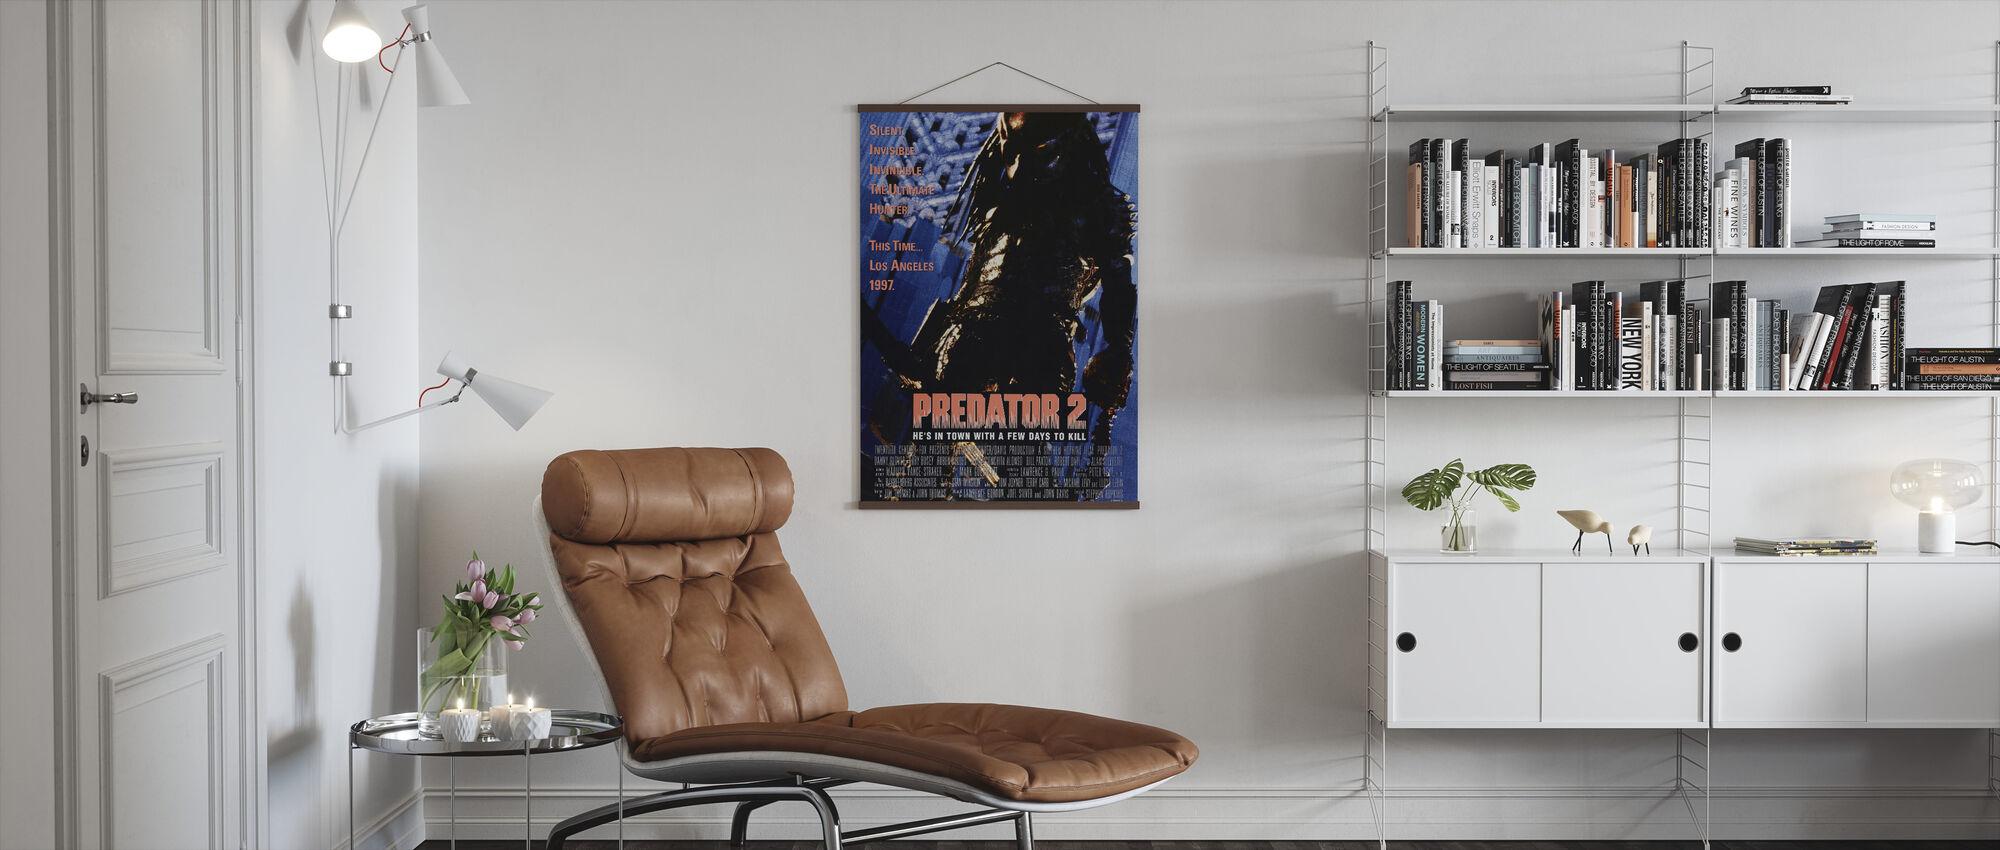 Predator 2 - Poster - Living Room